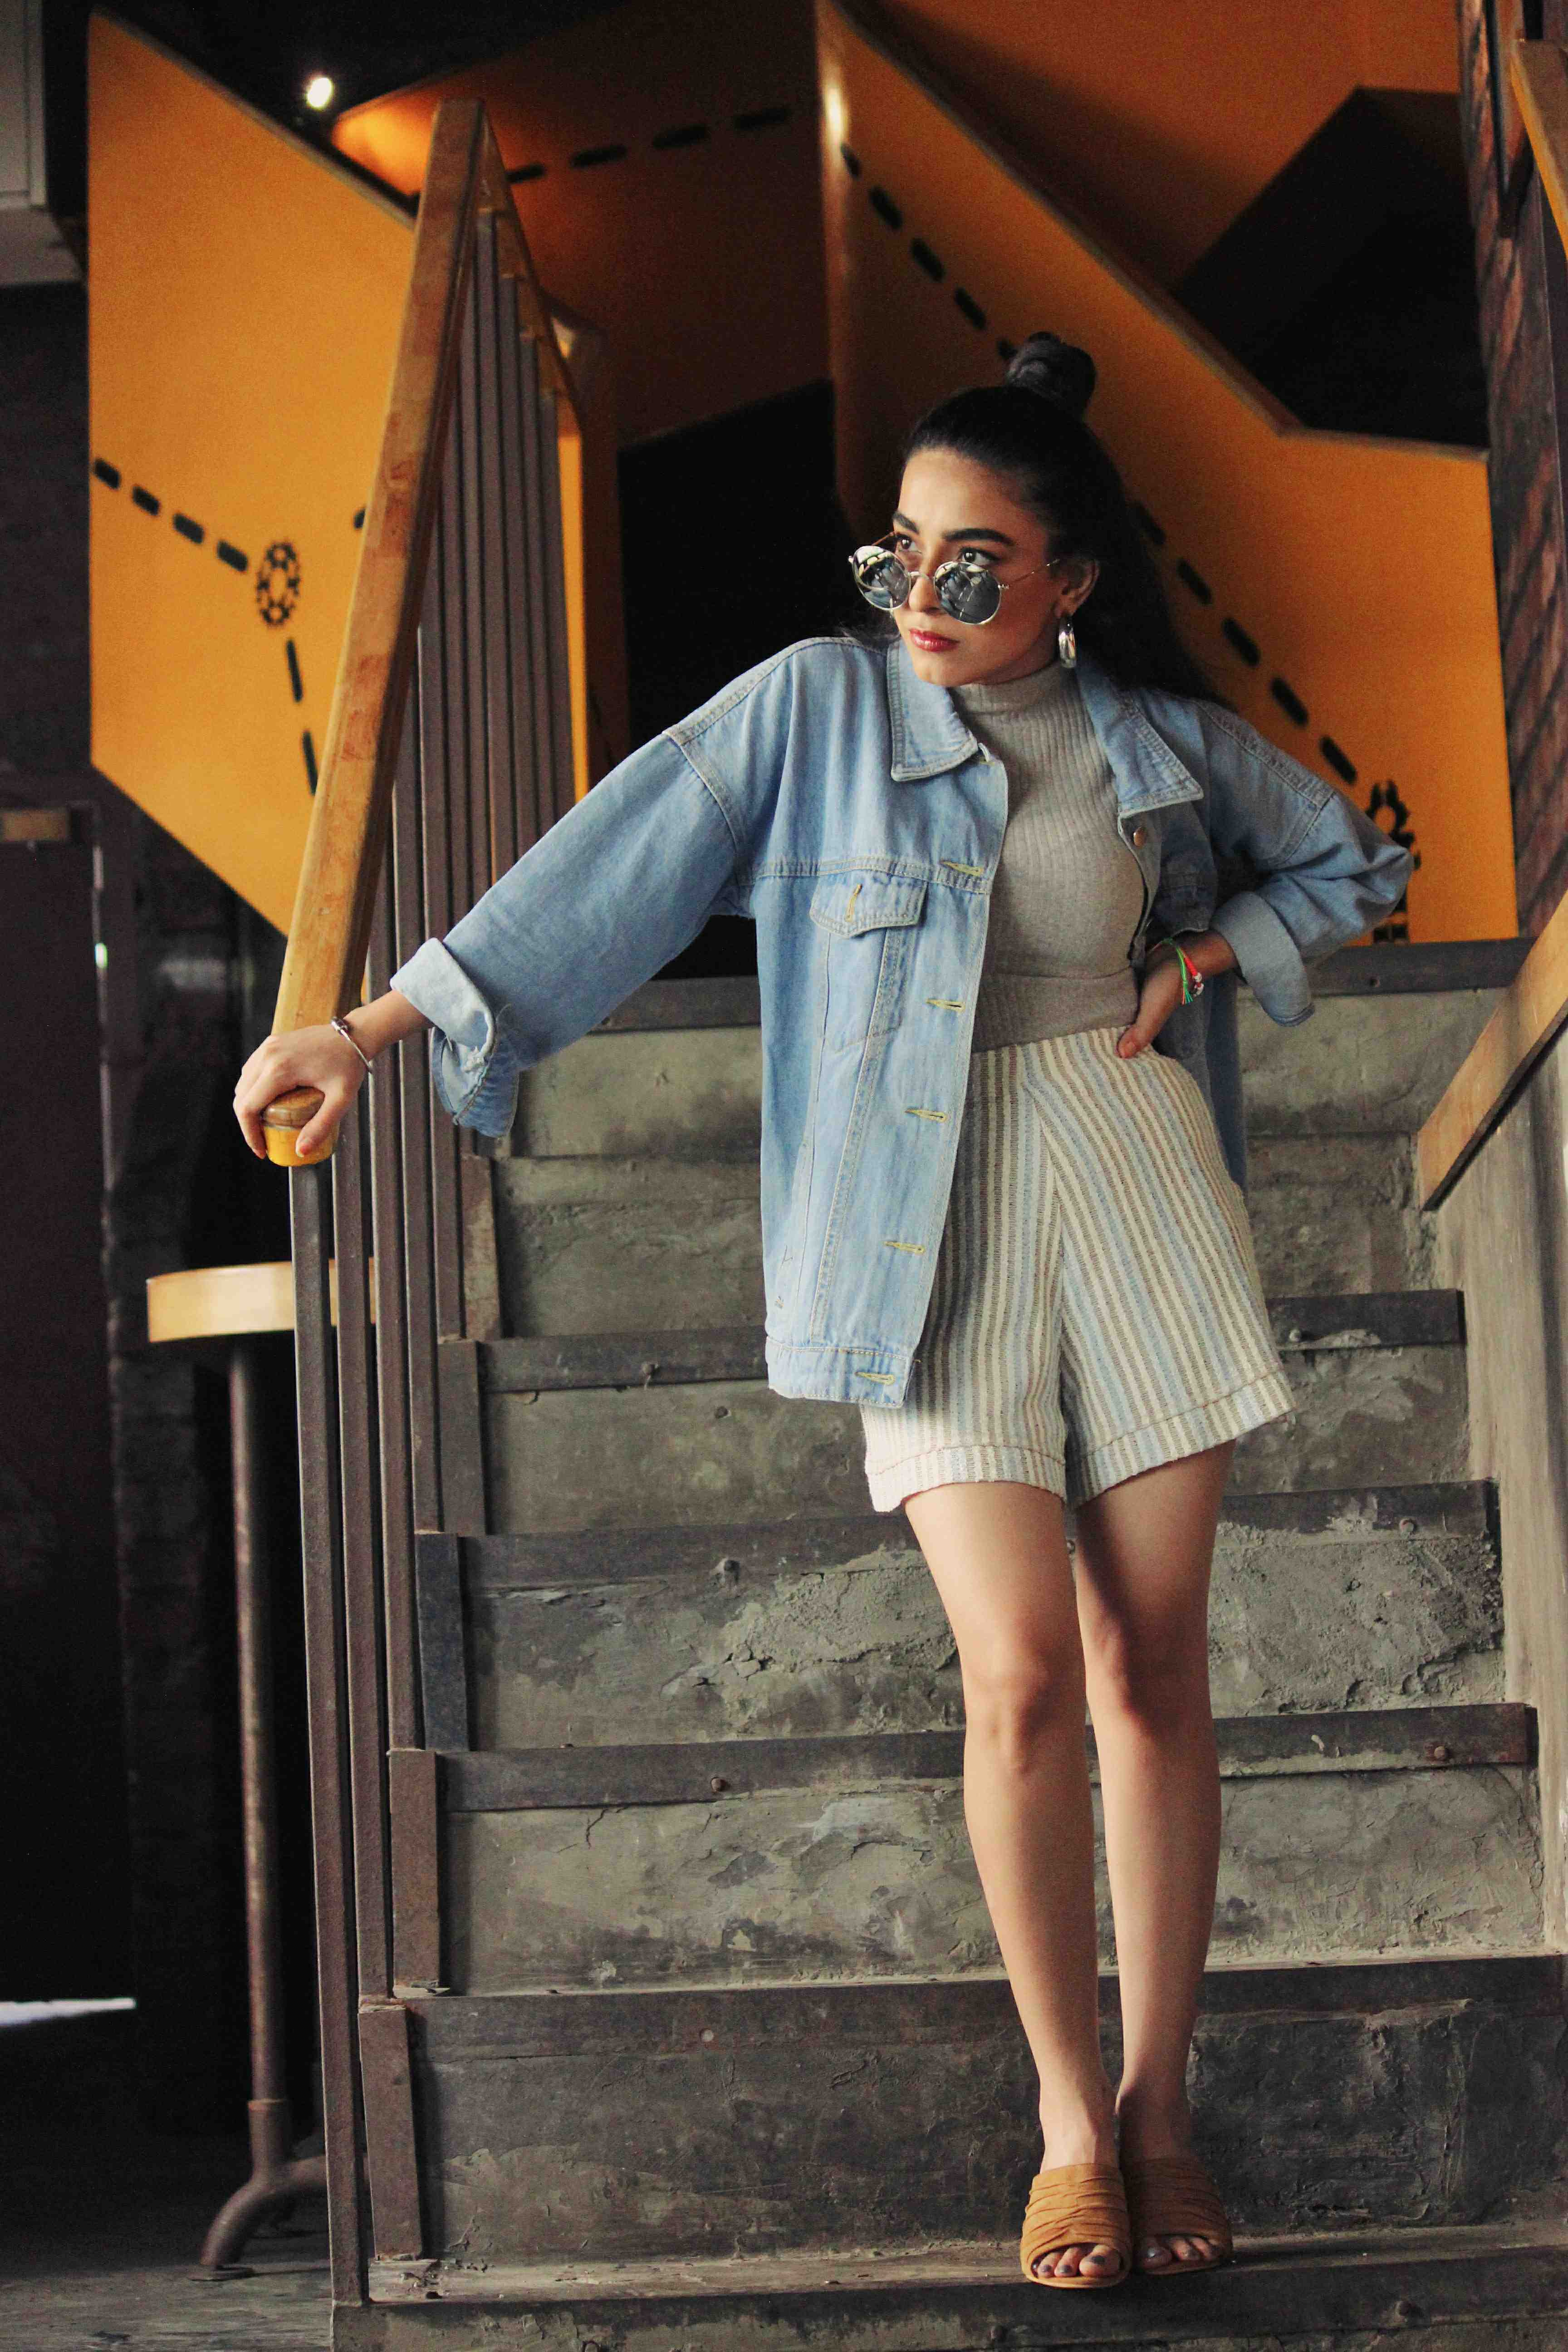 denim jacket, street style, denim jacket street style, jean jacket, vintage jacket, denim on denim, raw denim, fashion week, oversized denim jacket, oversized jacket, oversized jacket style, stylessential, outfit, inspo